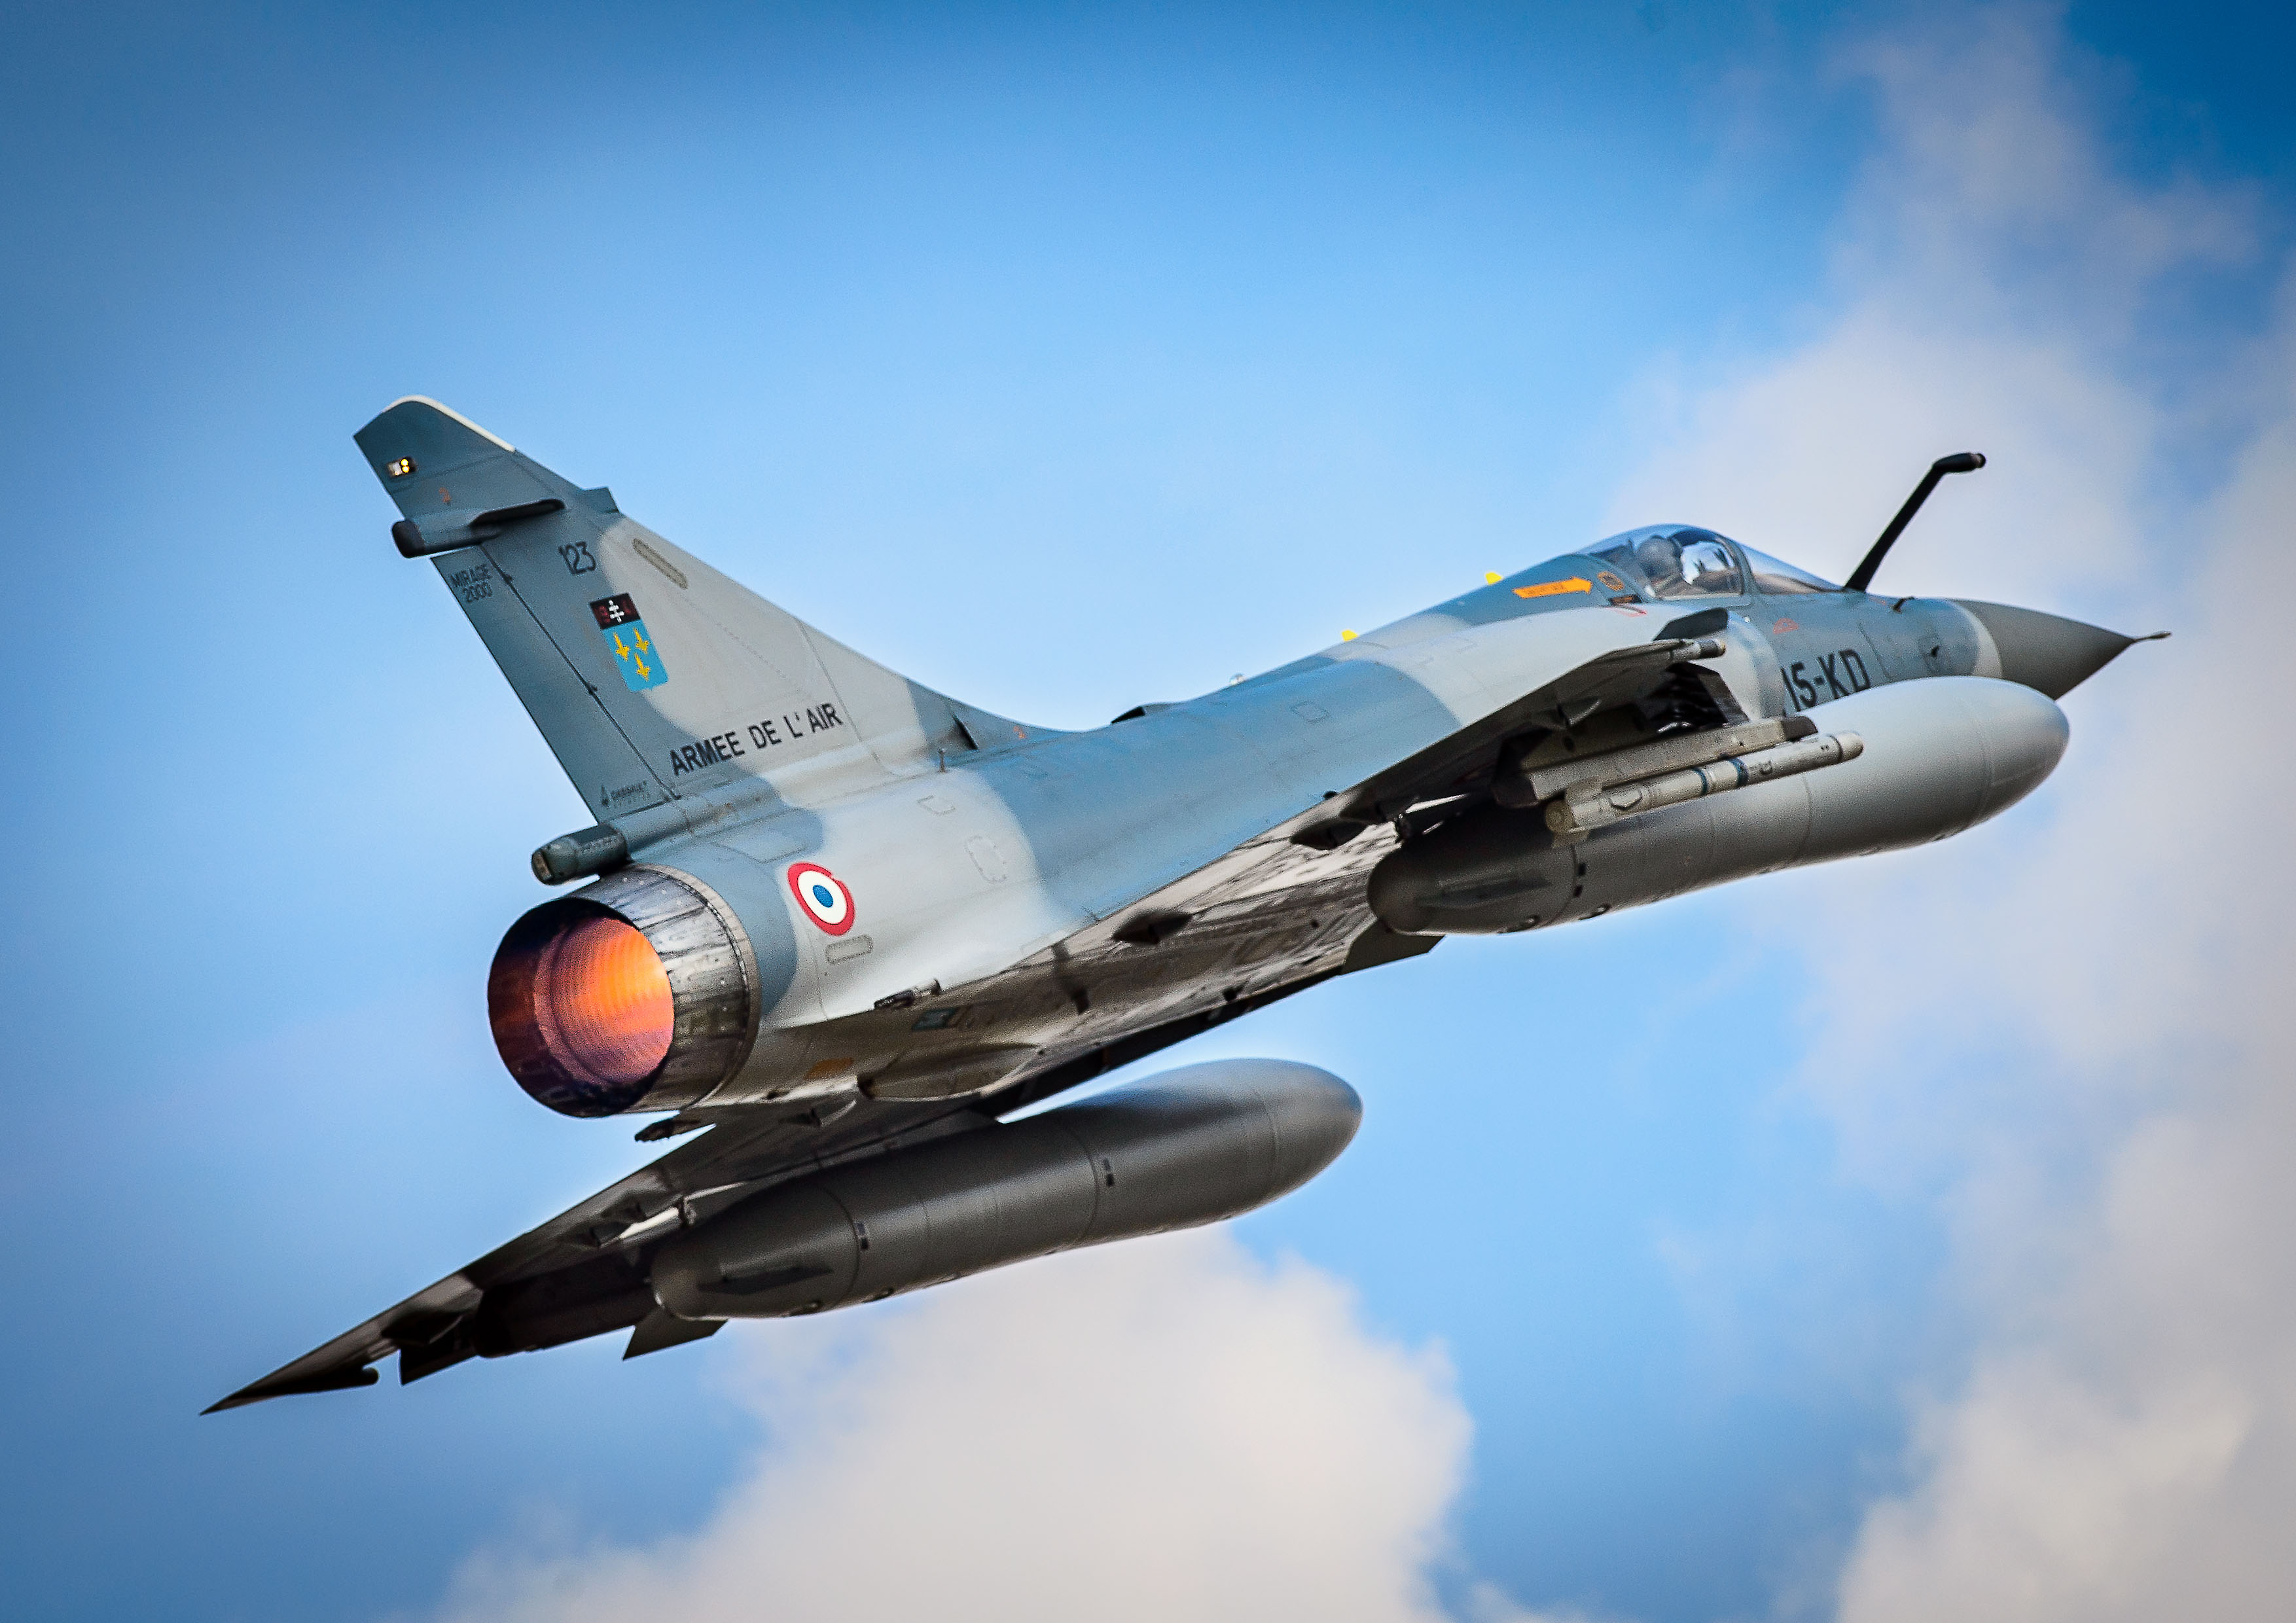 French_Air_Force_Dassault_Mirage_2000C_t